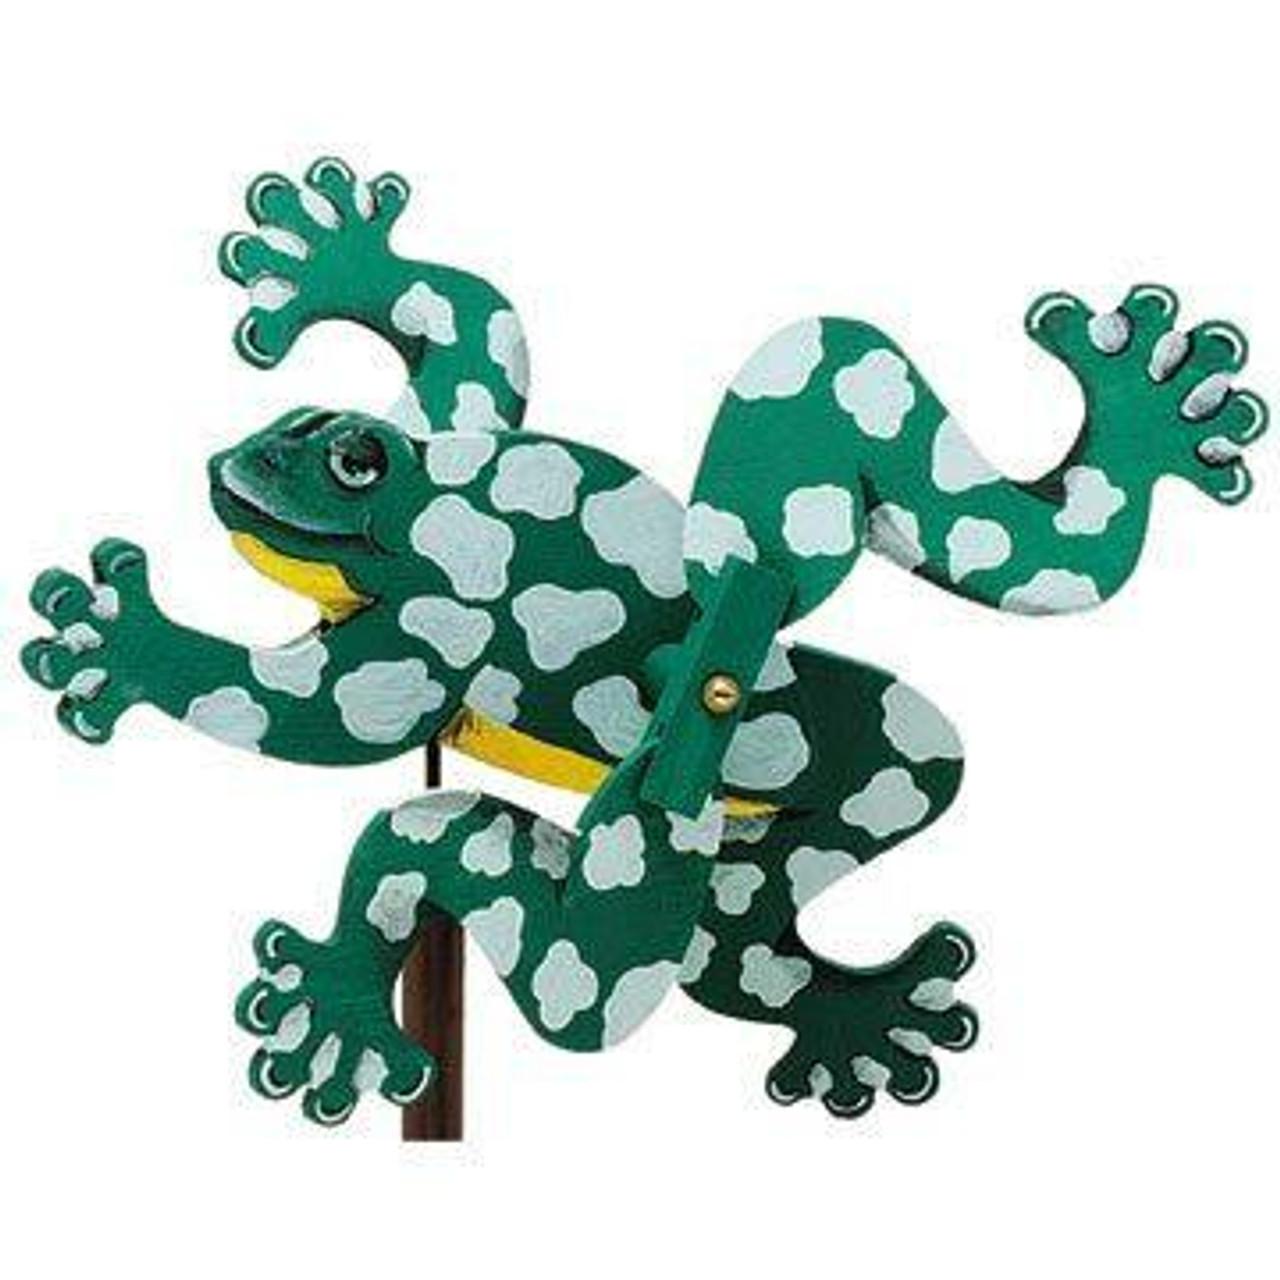 Cherry Tree Toys Frog Whirligig Plan